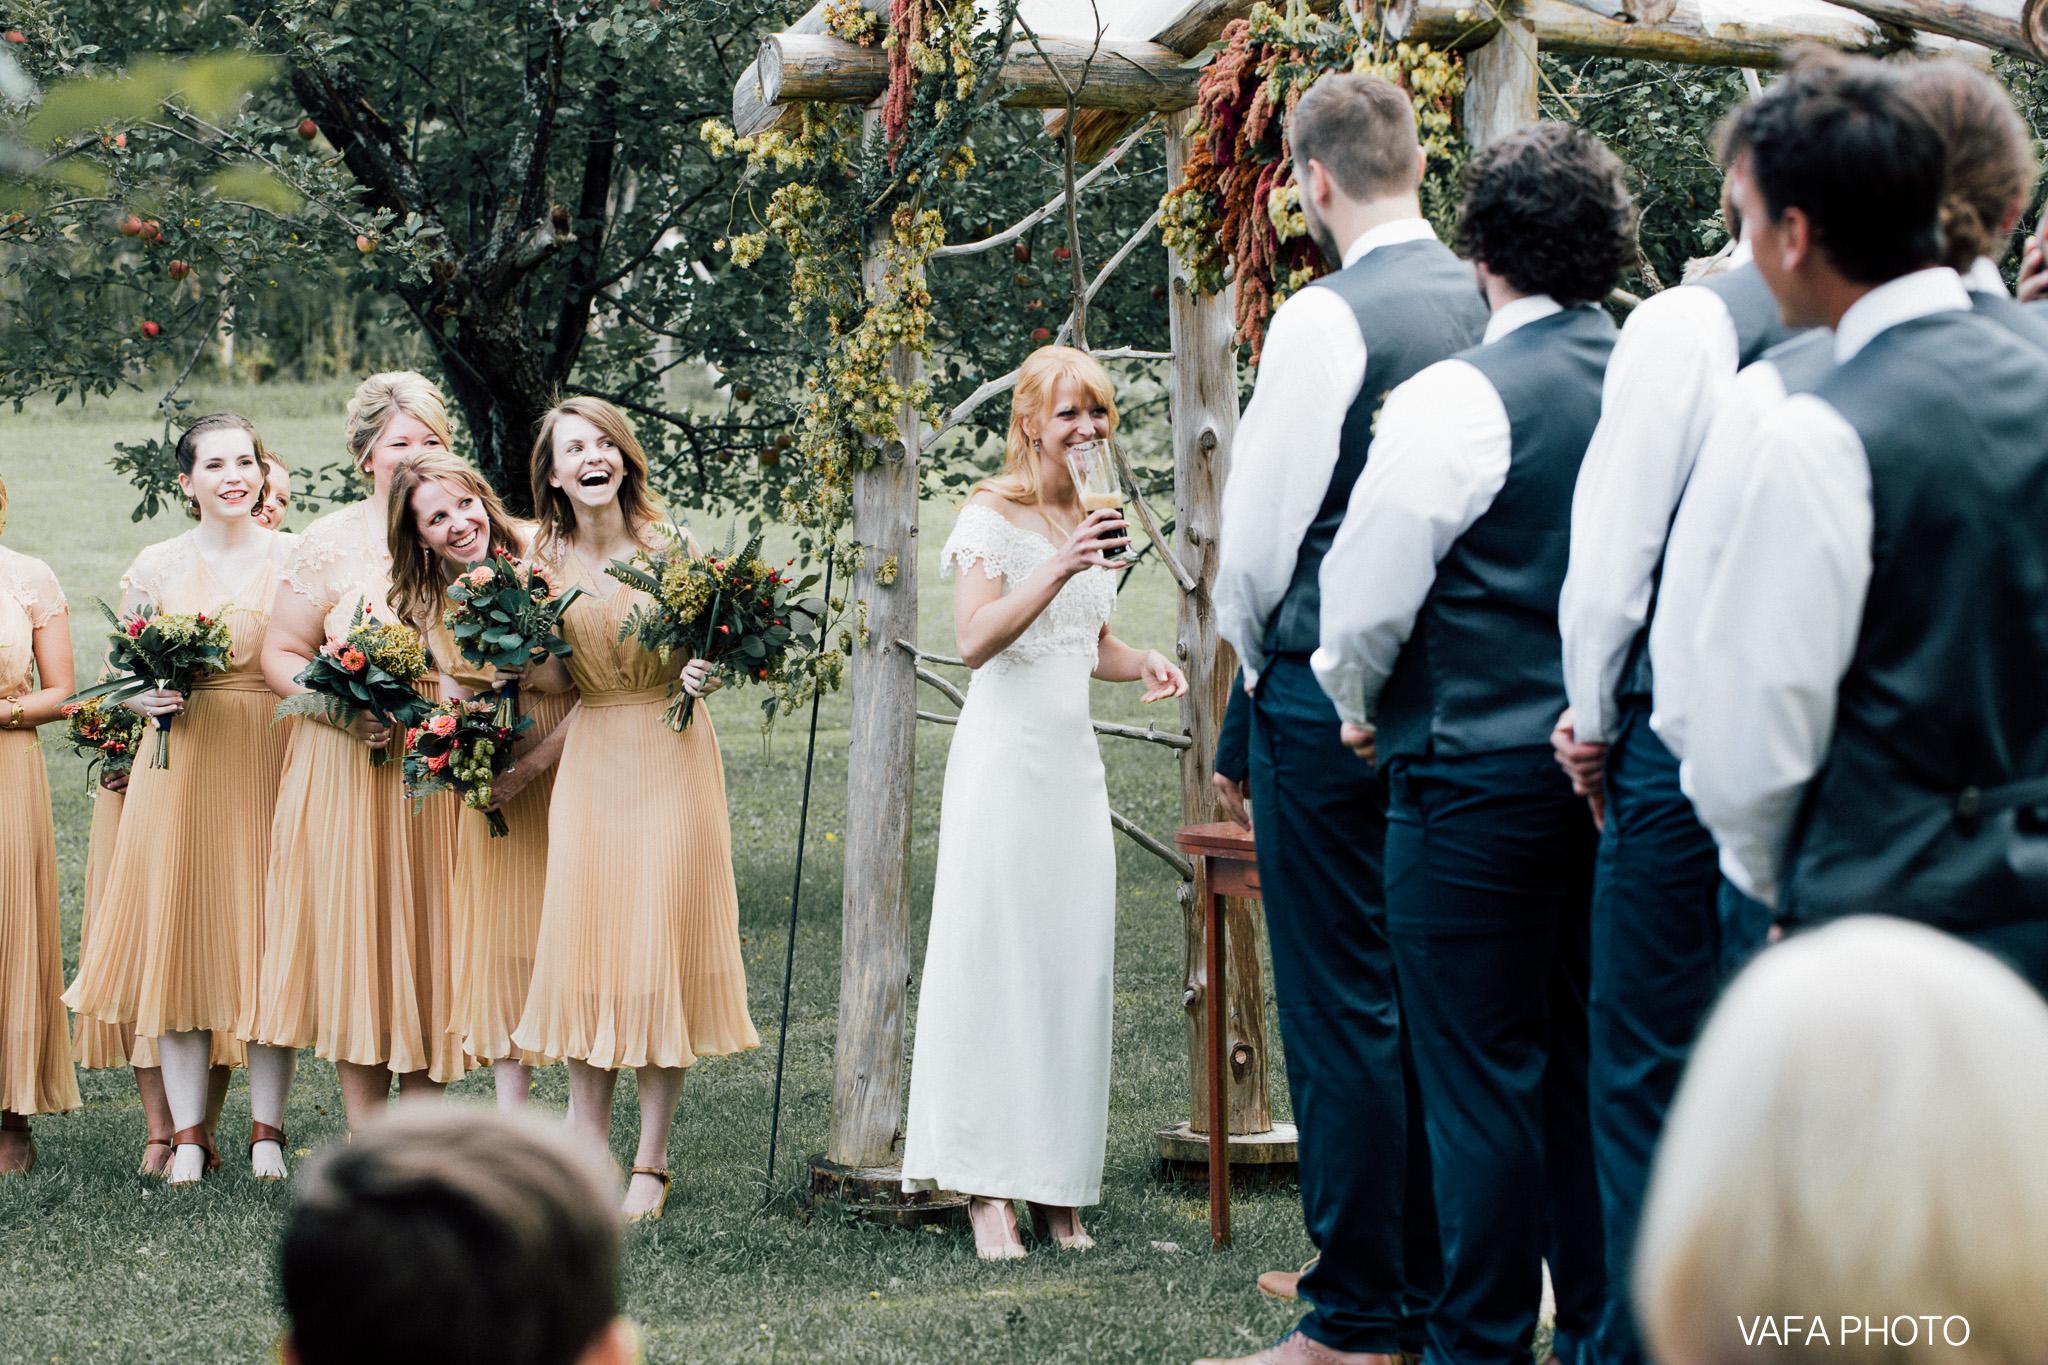 Belsolda-Farm-Wedding-Christy-Eric-Vafa-Photo-462.jpg